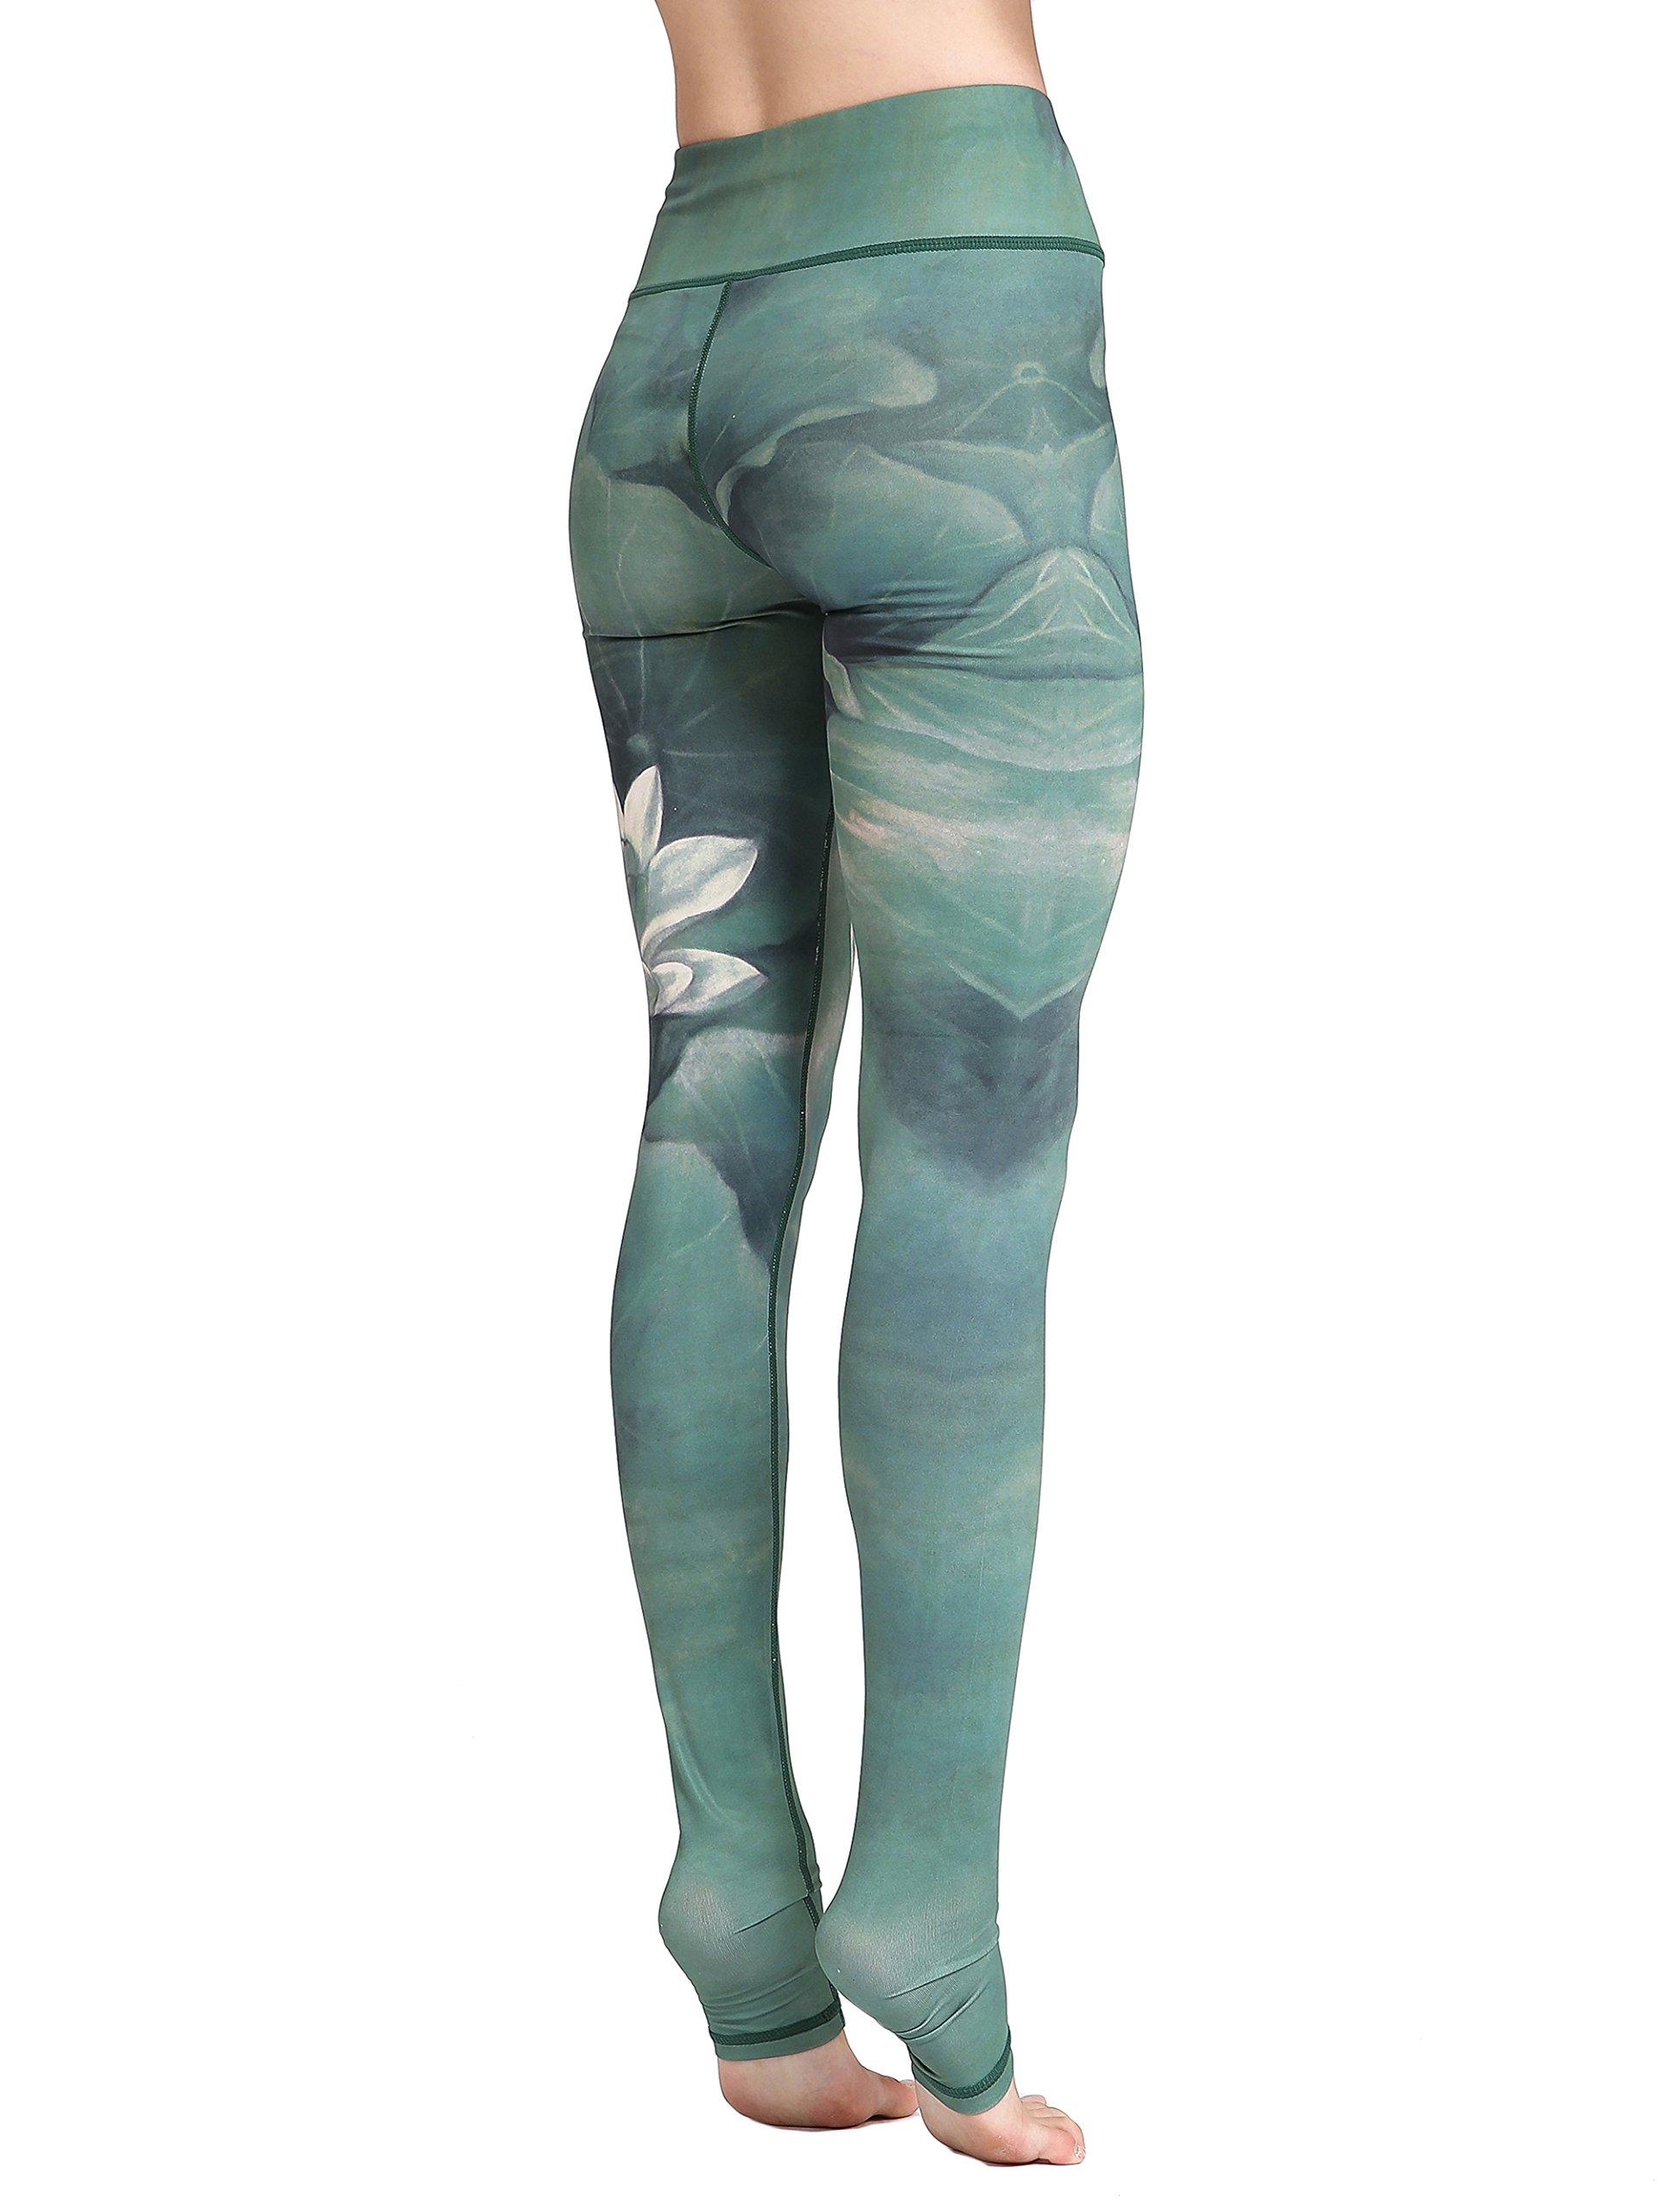 6e7a230052 81bMuTetW0L - FLYILY Women's Long Yoga Pants Sports Leggings Running Tights  High Waist Stretch Fitness Trousers